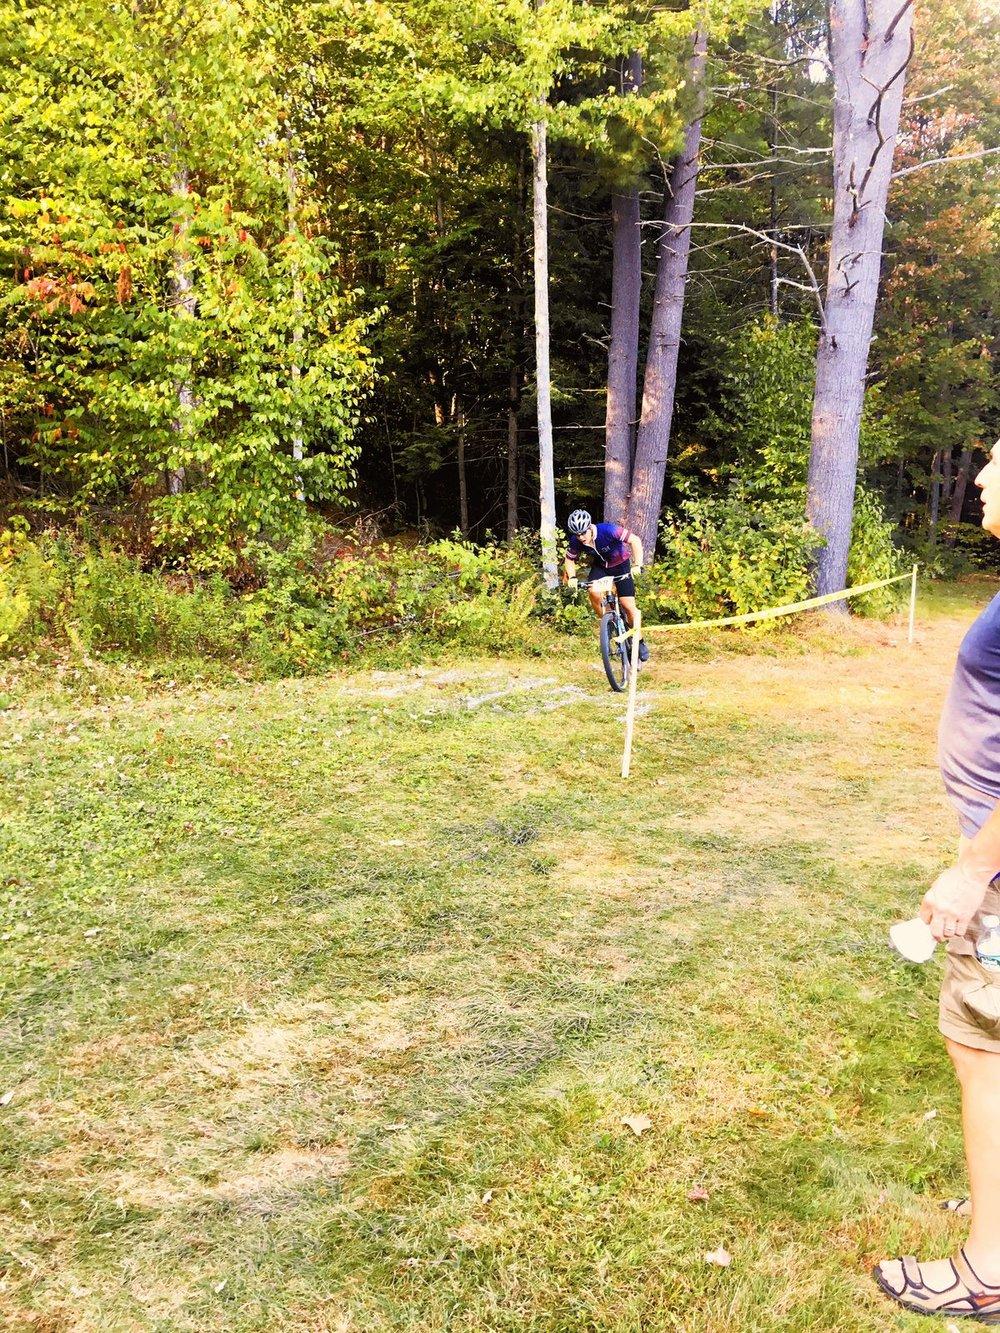 Mountain Biking at Vermont Academy - September 27, 2017  - 7958.JPG